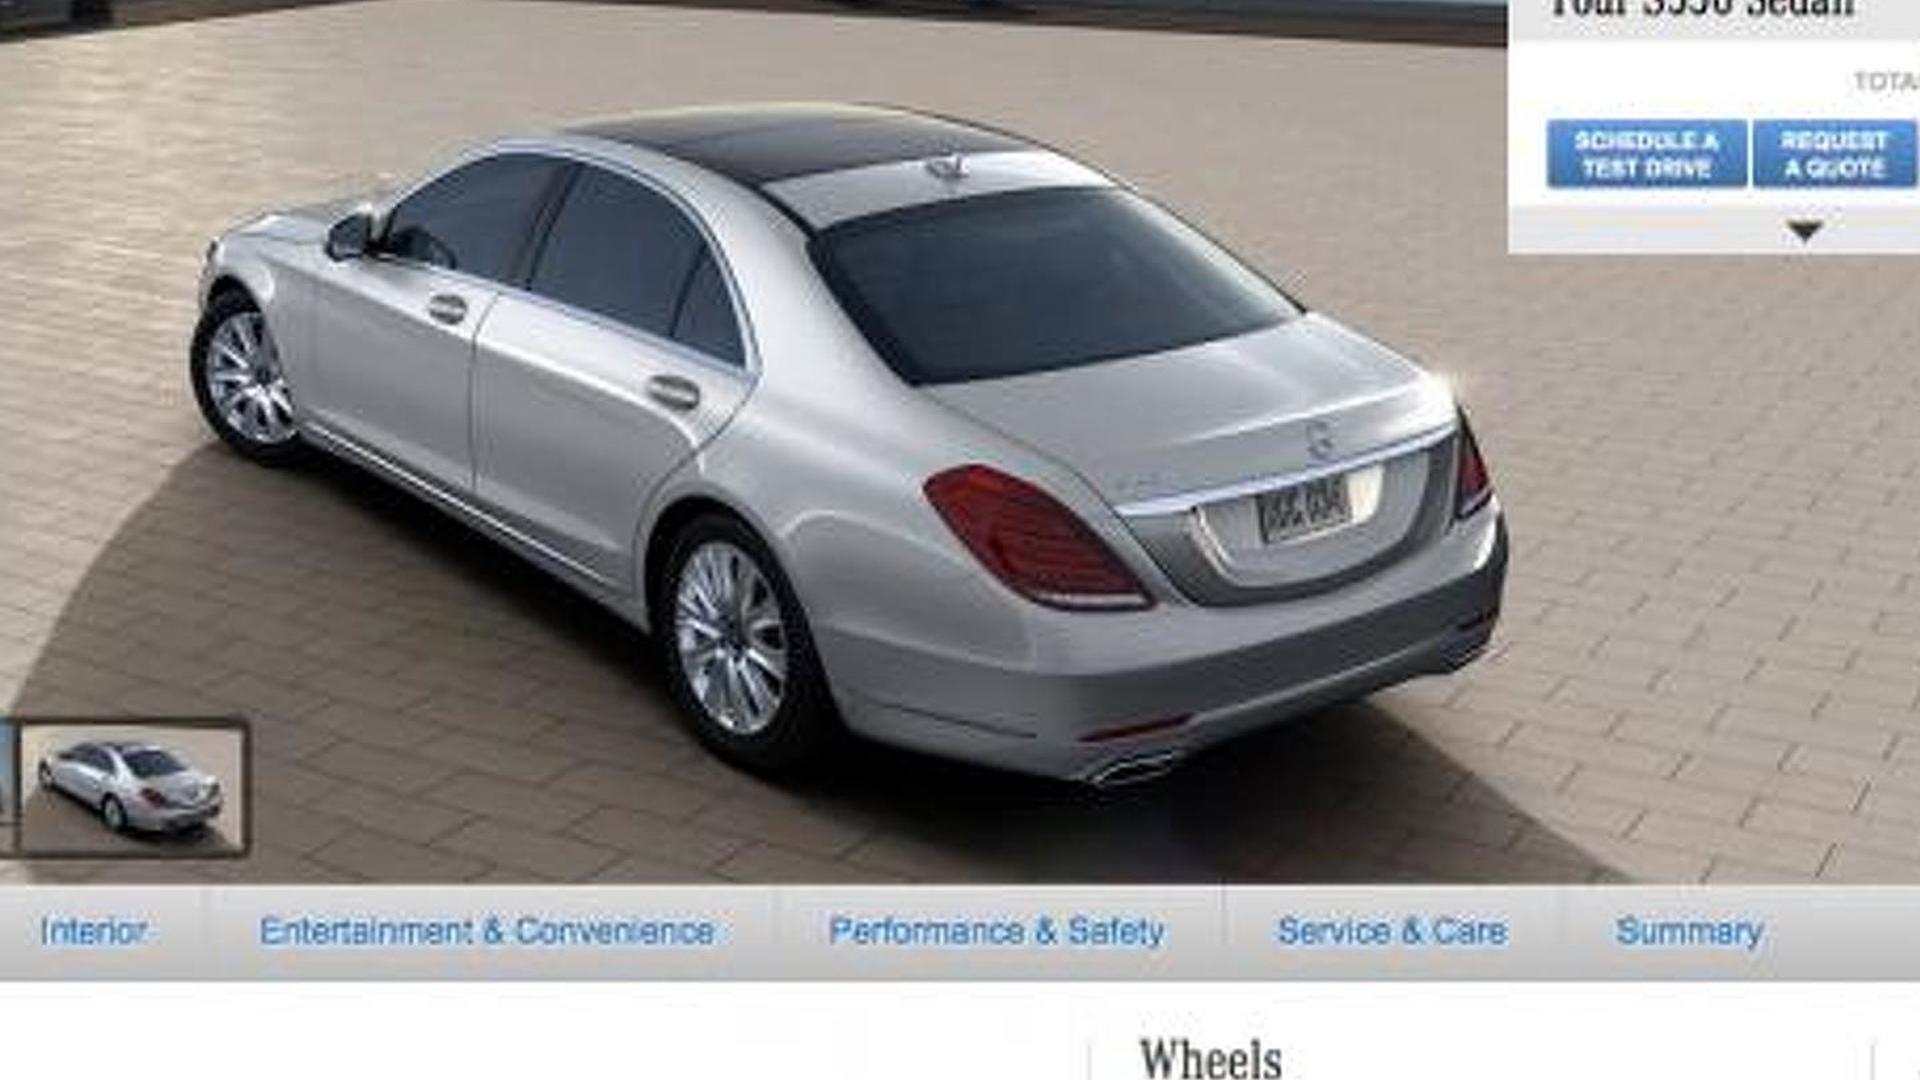 2014 Mercedes-Benz S-Class configurator now live